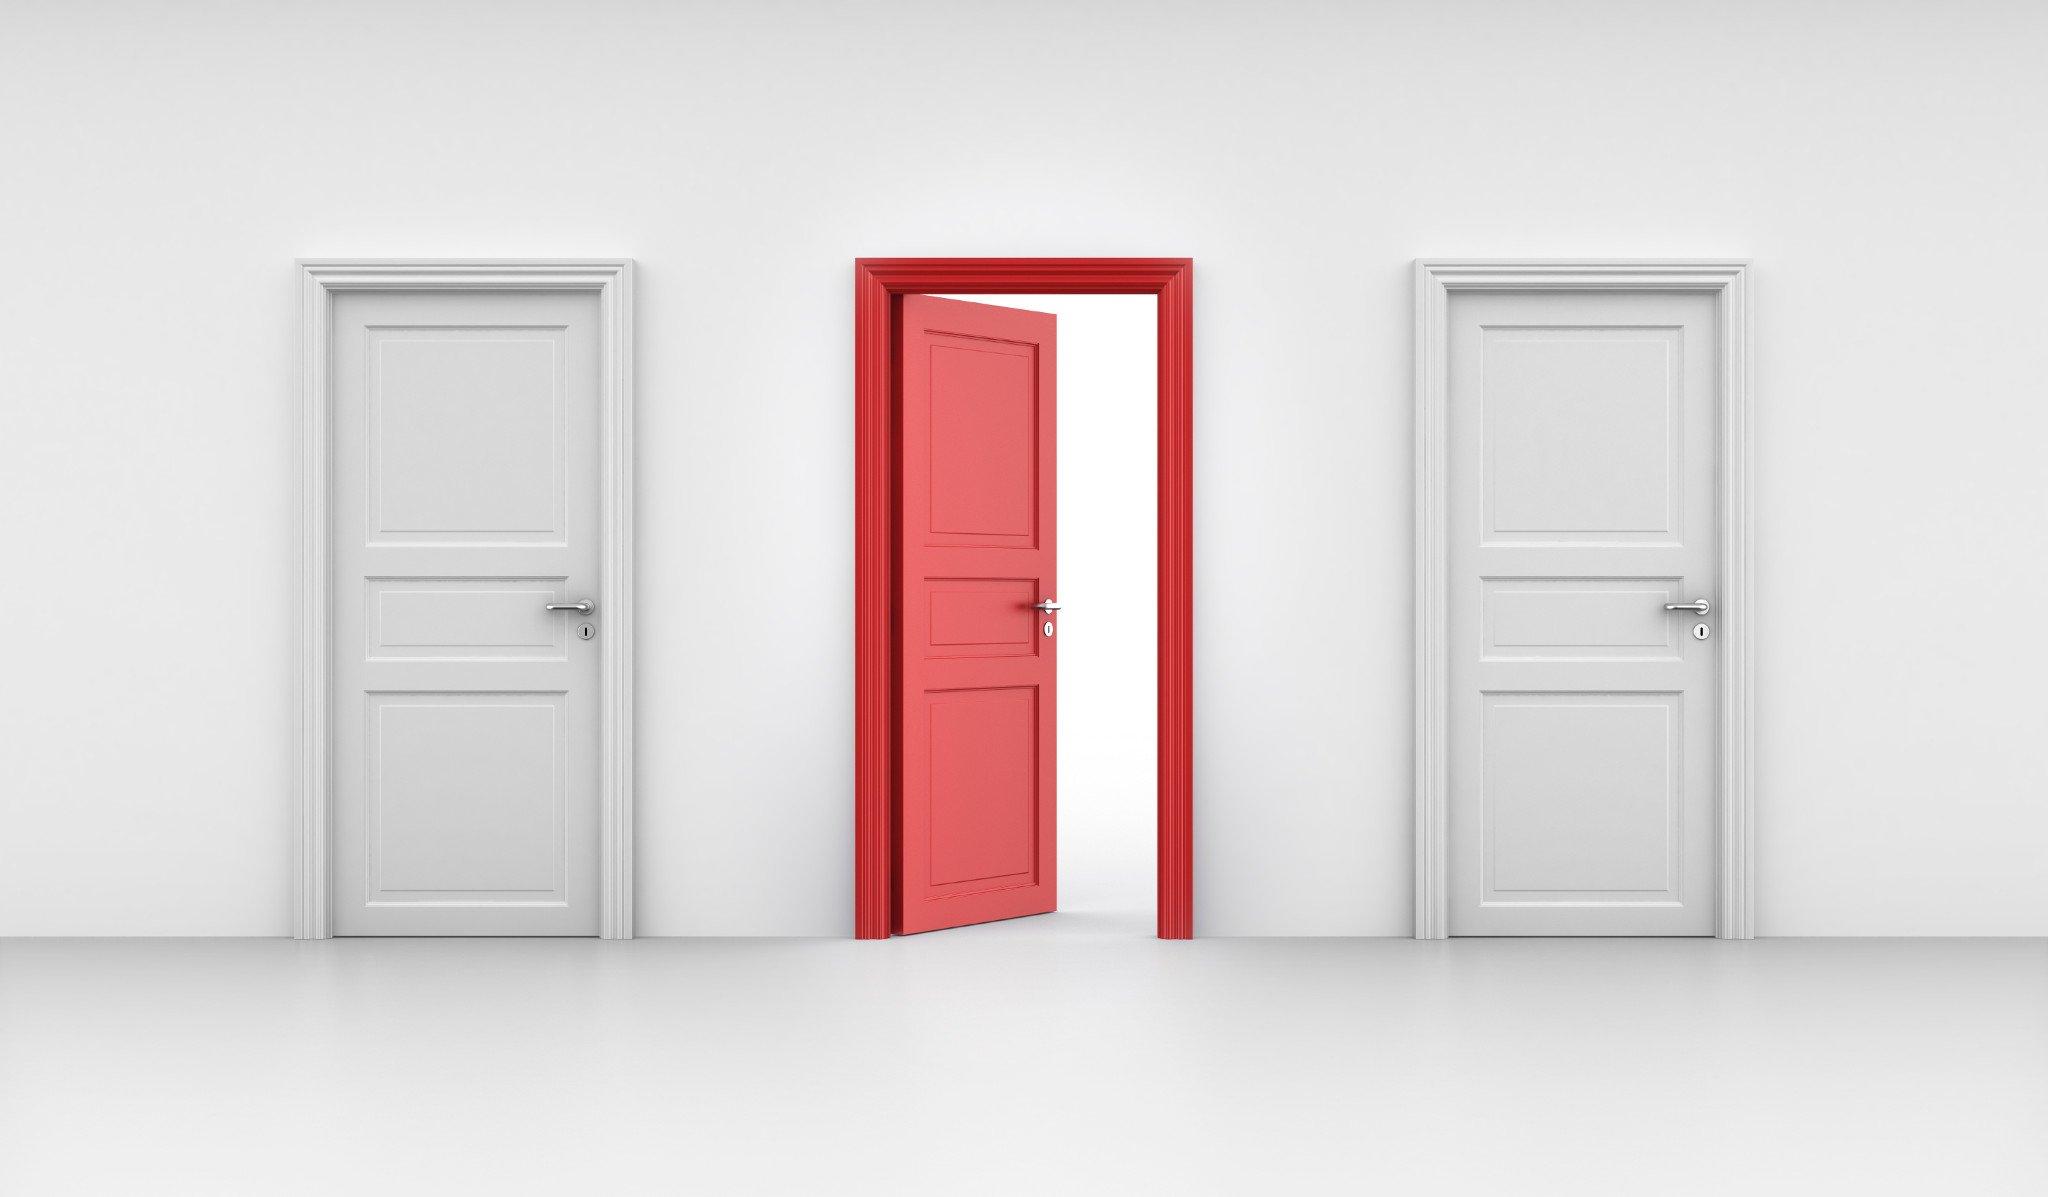 three-doors-one-red